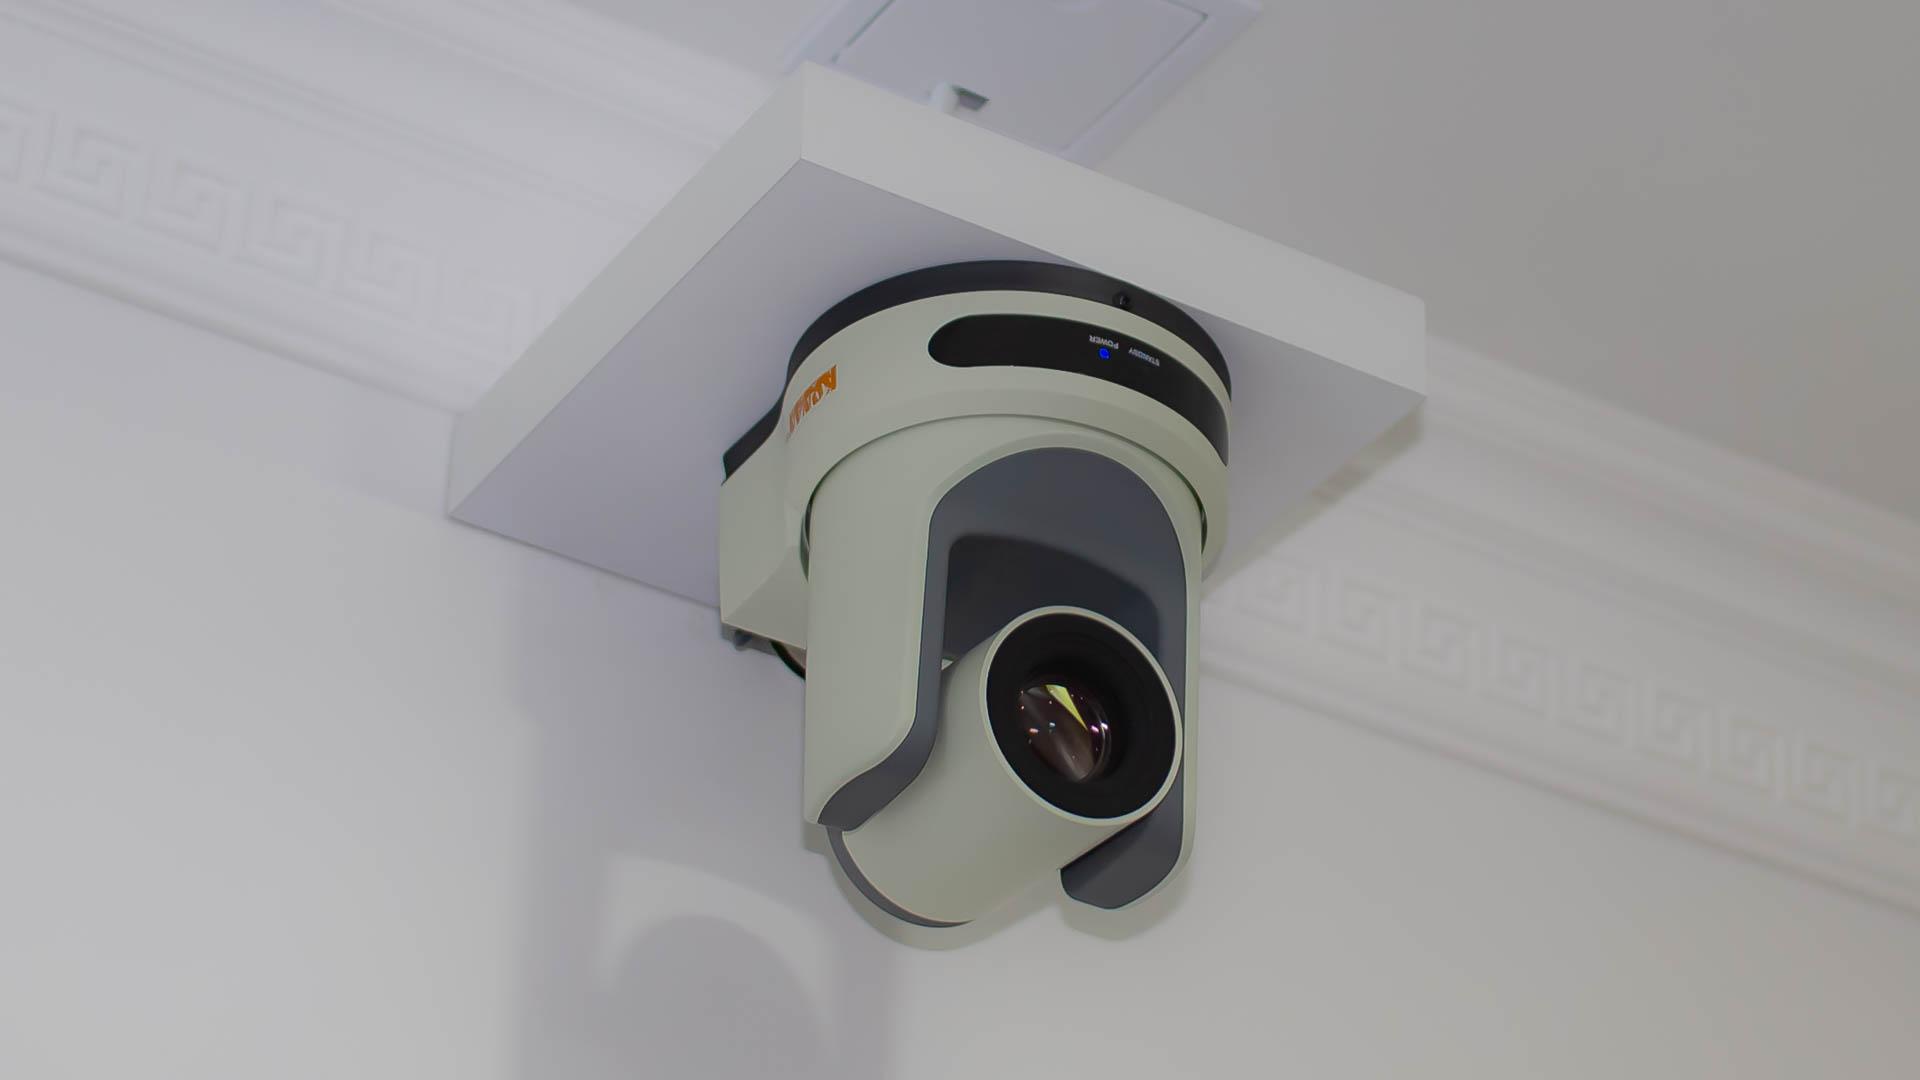 Оборудование для видеоконференцсвязи